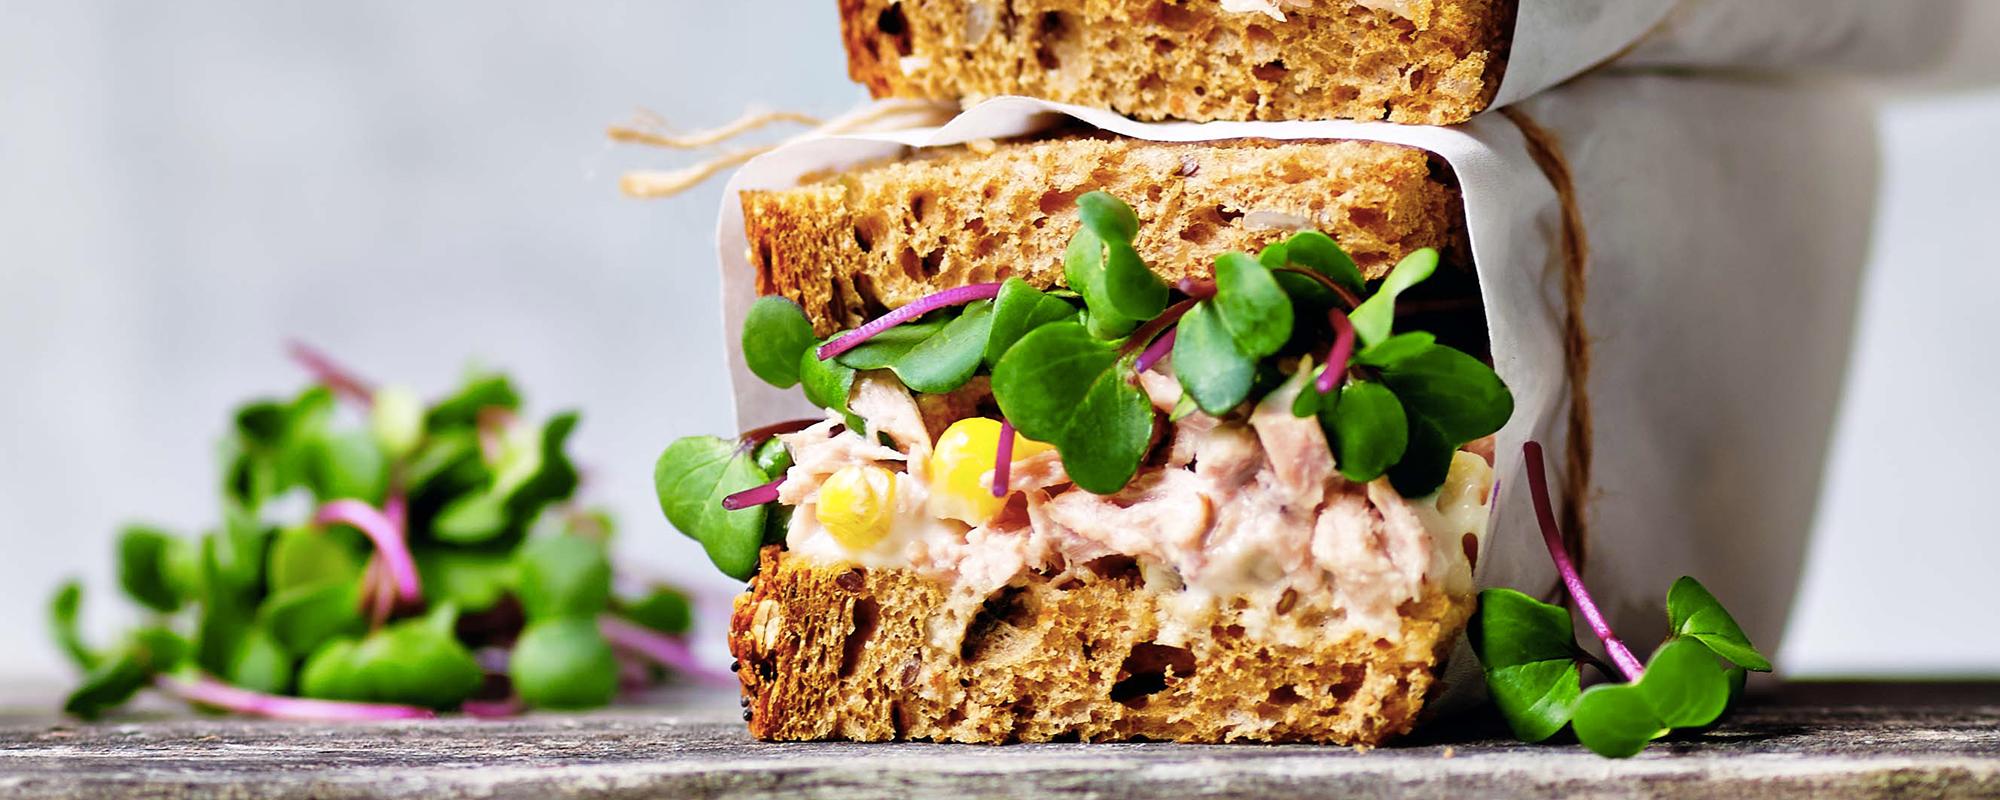 Tuna mayonnaise with Pink Radish